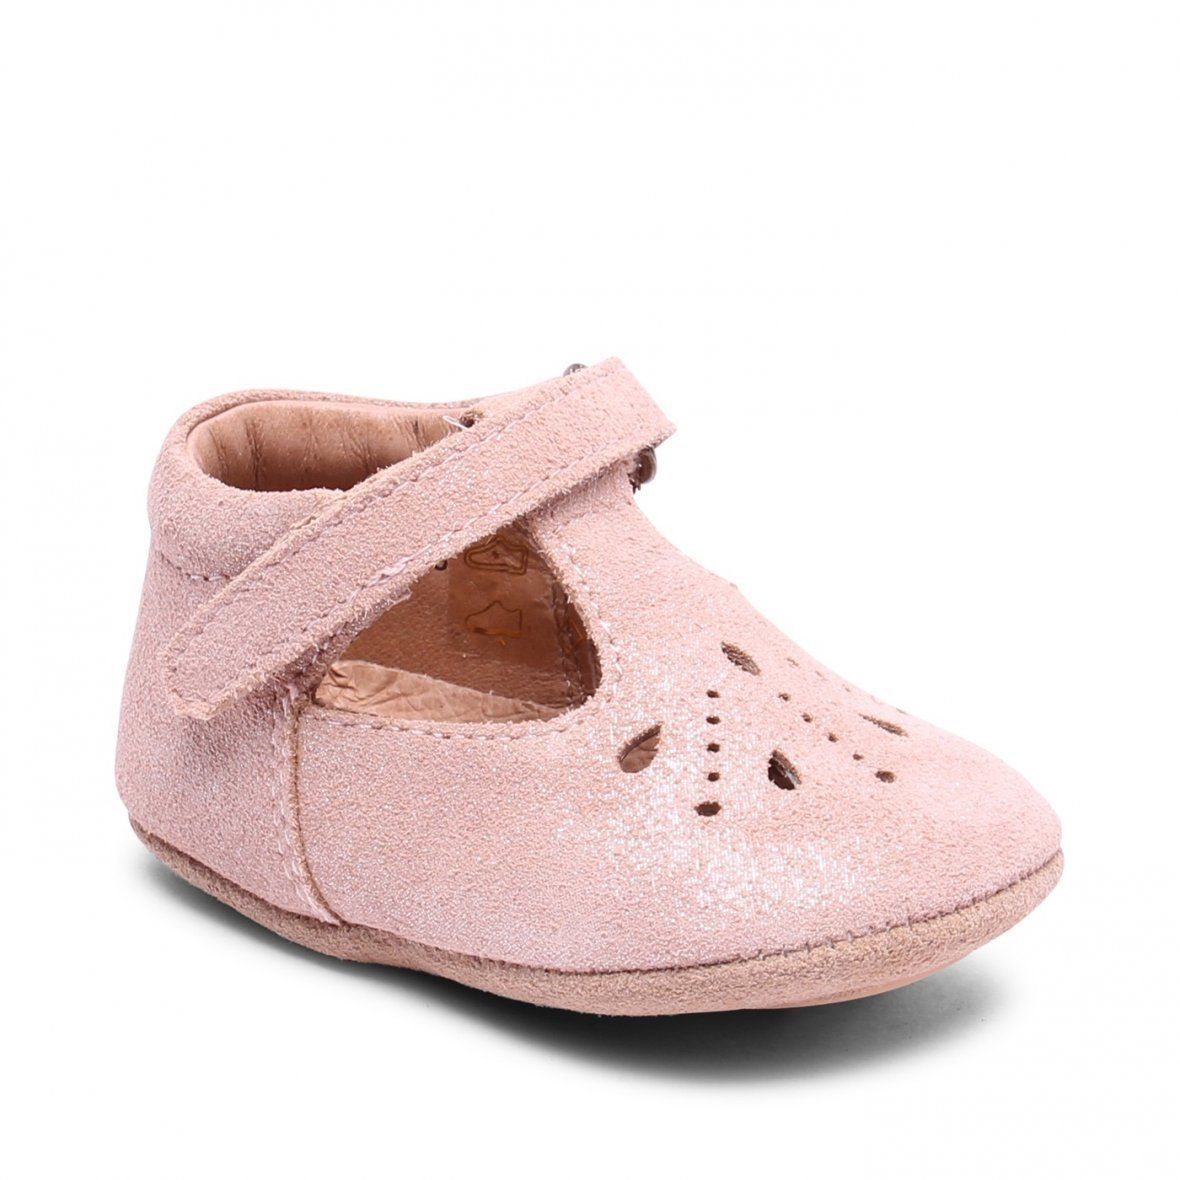 3bdaa298303f Bisgaard - Glitter Nude - Hjemmesko - 25 - Loafers